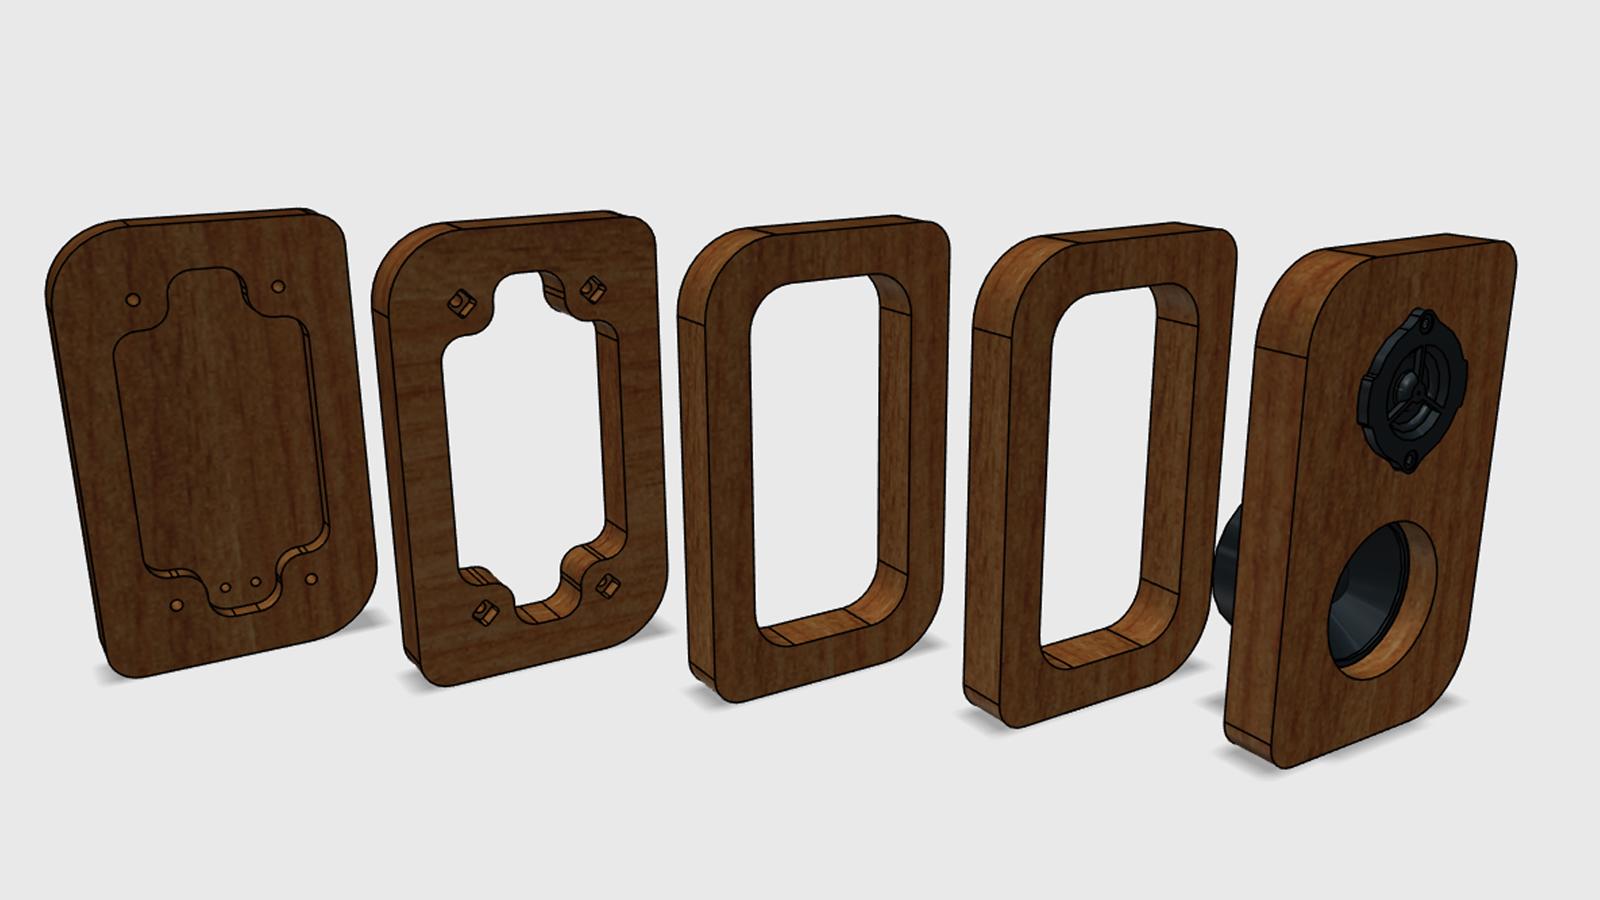 Reproduktory z akátového dřeva - expode